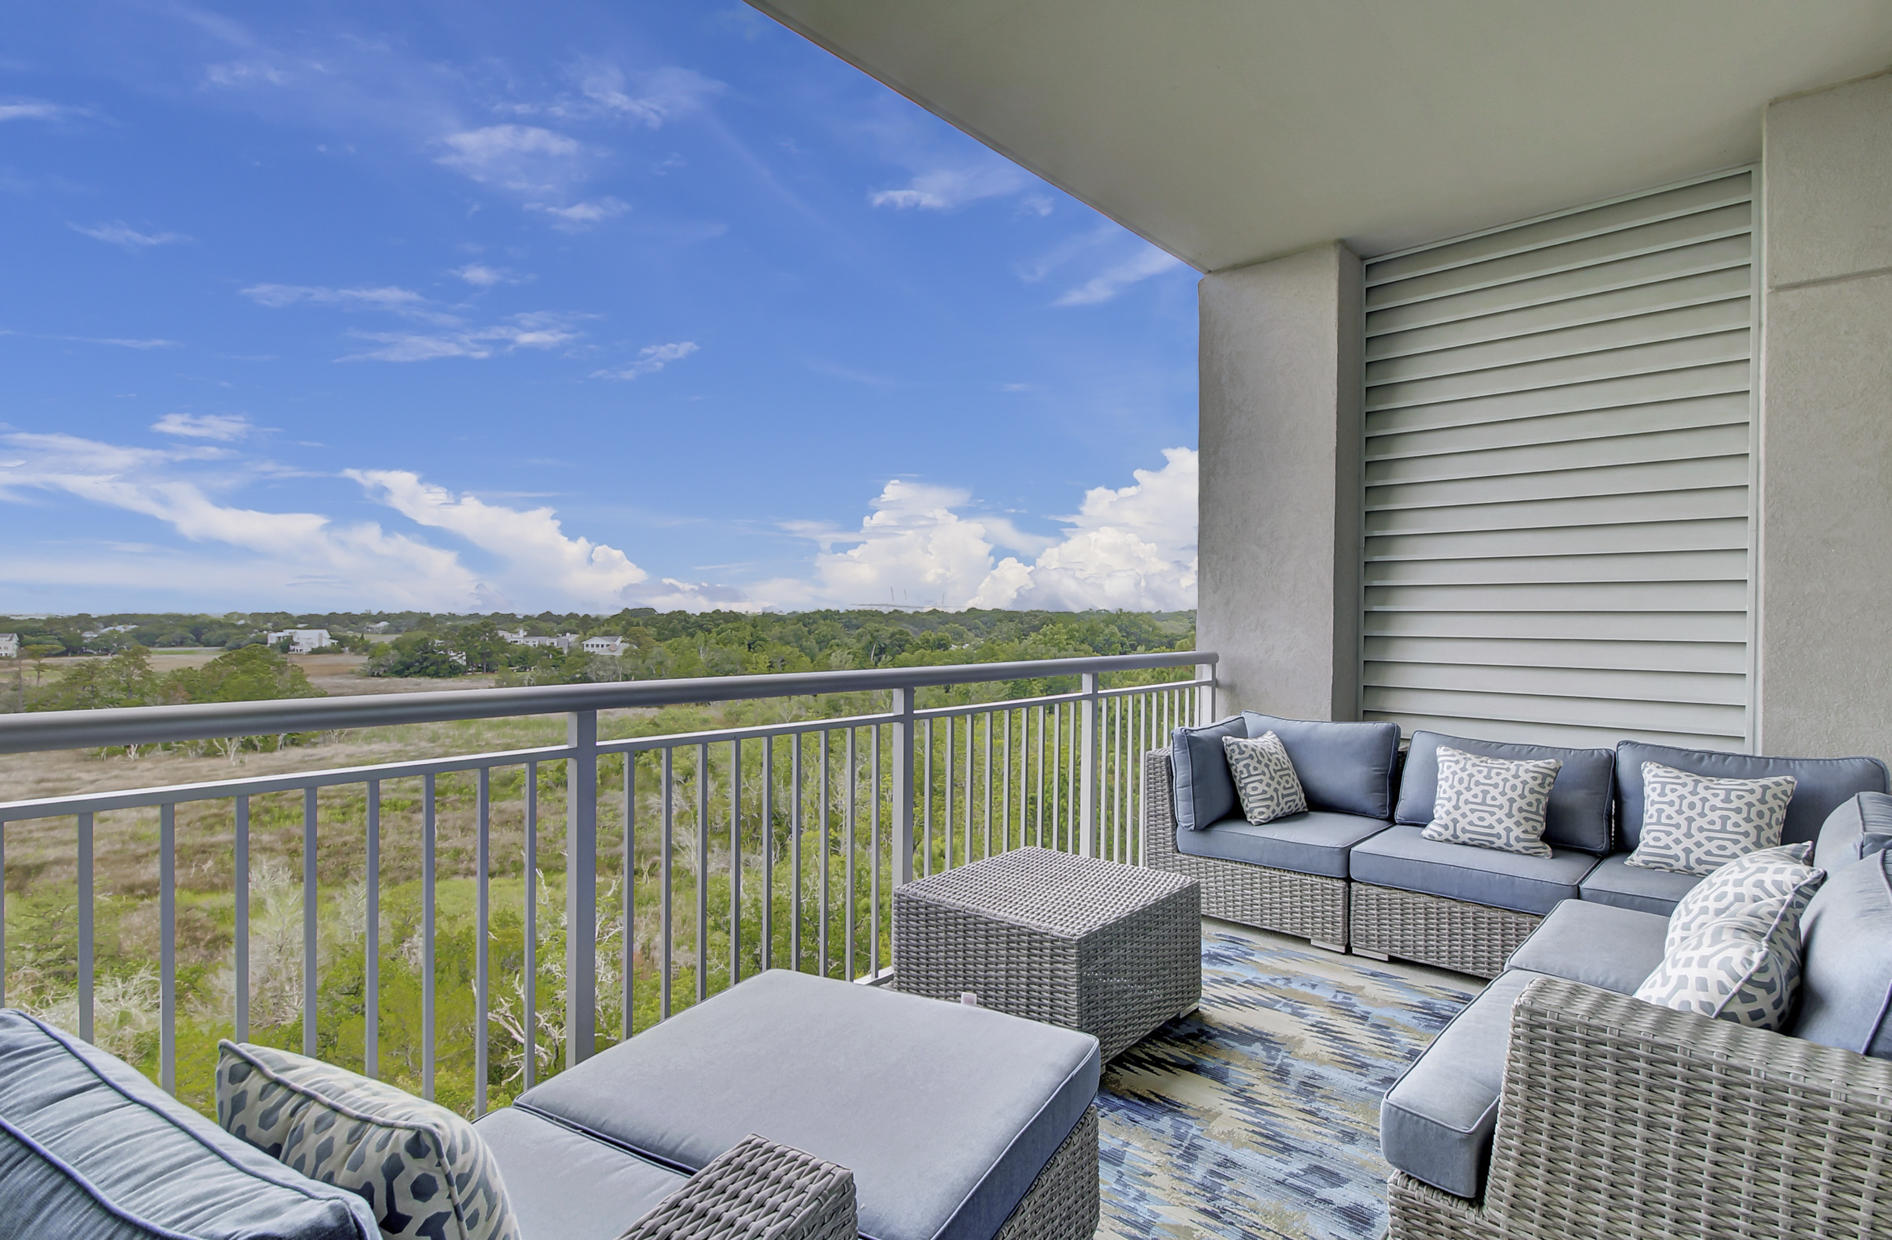 Tides IV Condominiums Homes For Sale - 155 Wingo Way, Mount Pleasant, SC - 0